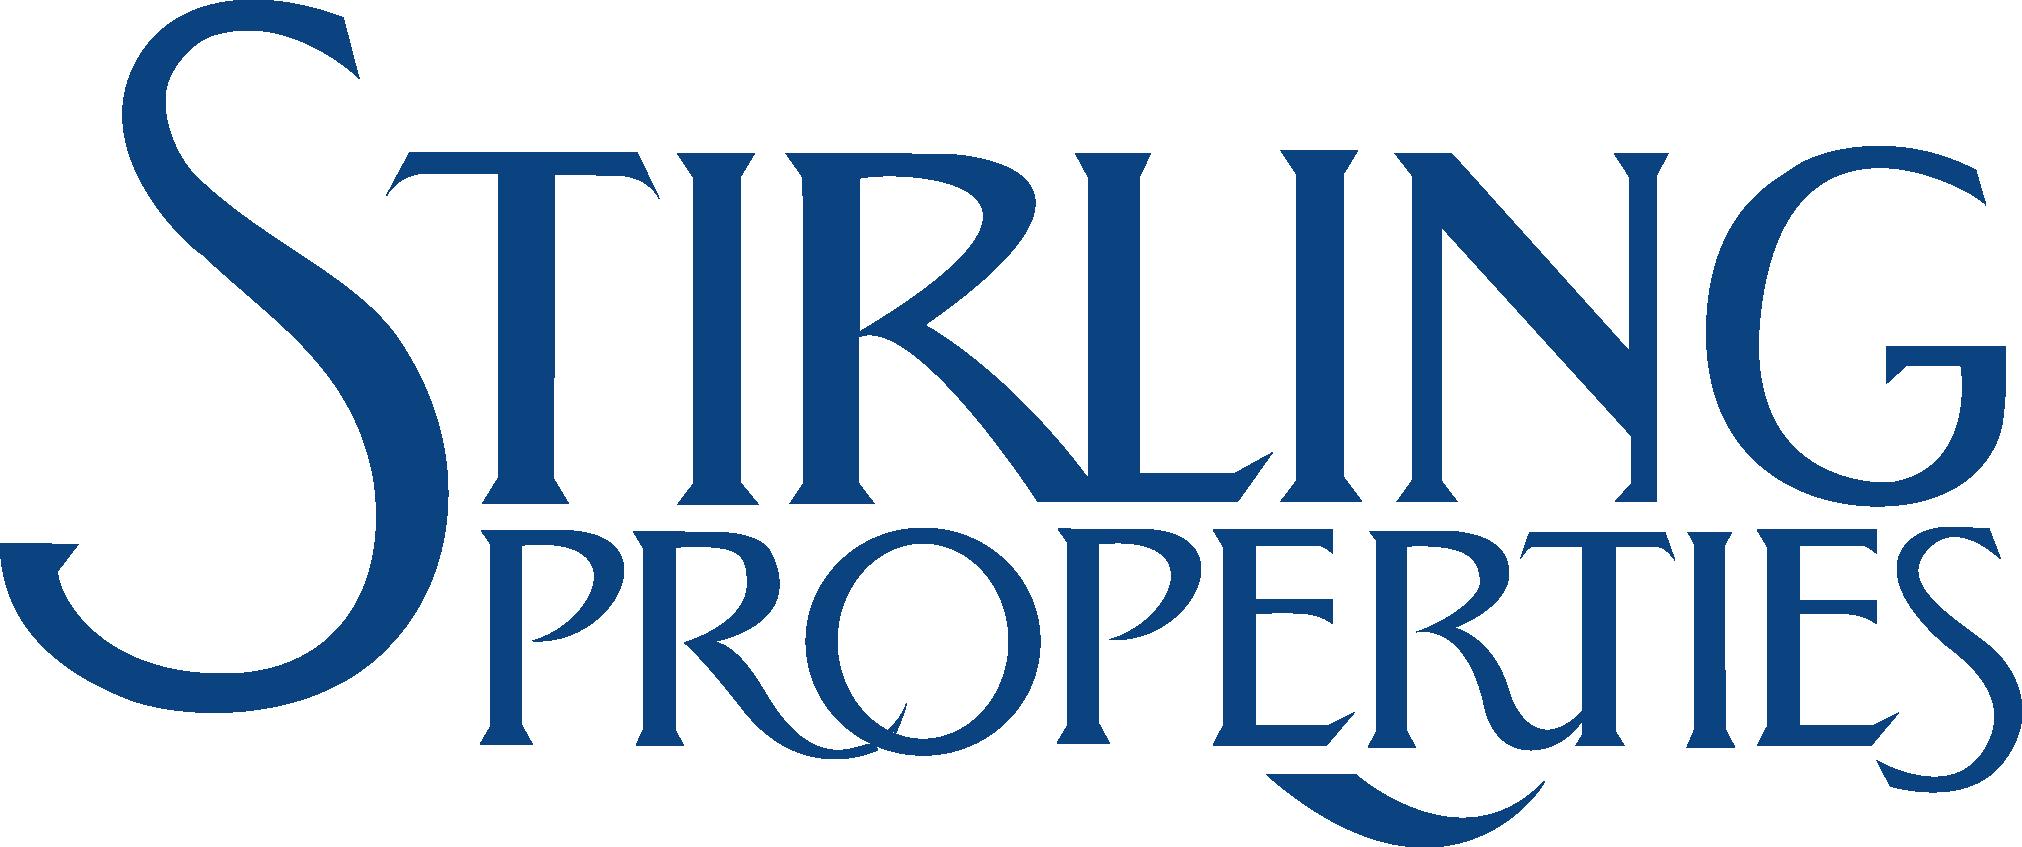 Stirling Properties